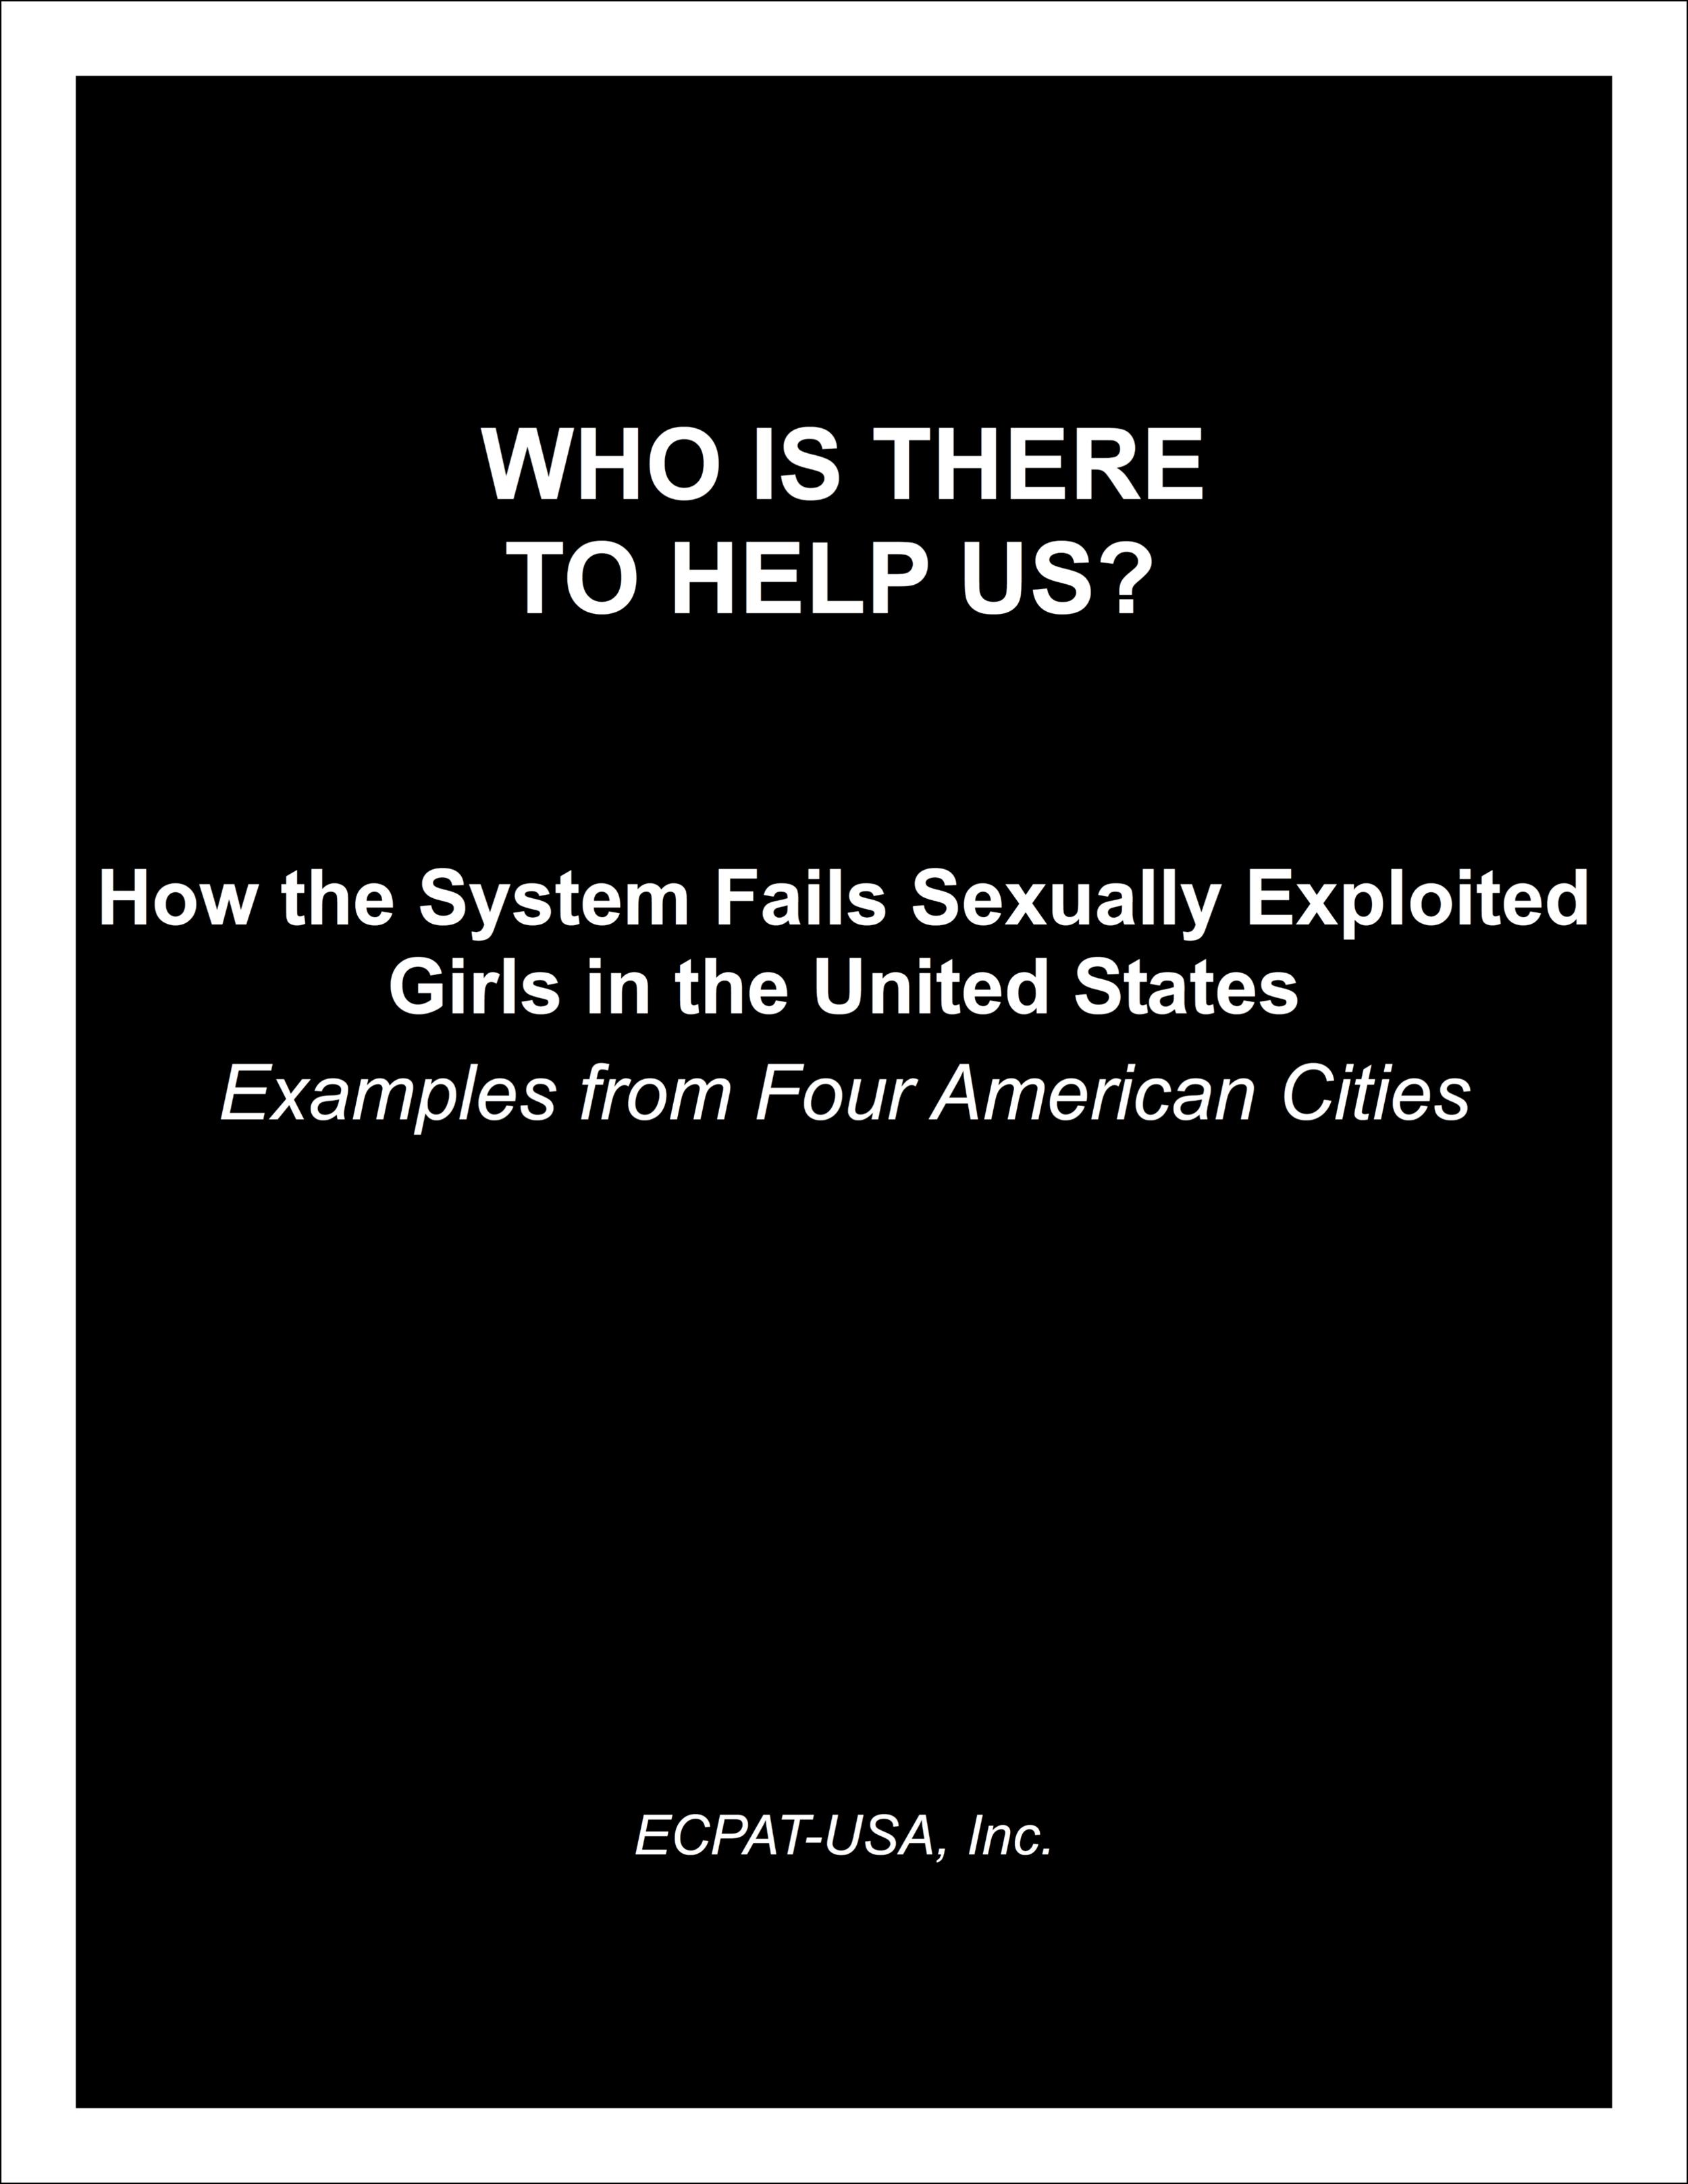 ECPAT-USA_WhoIsThereToHelpUs_.png